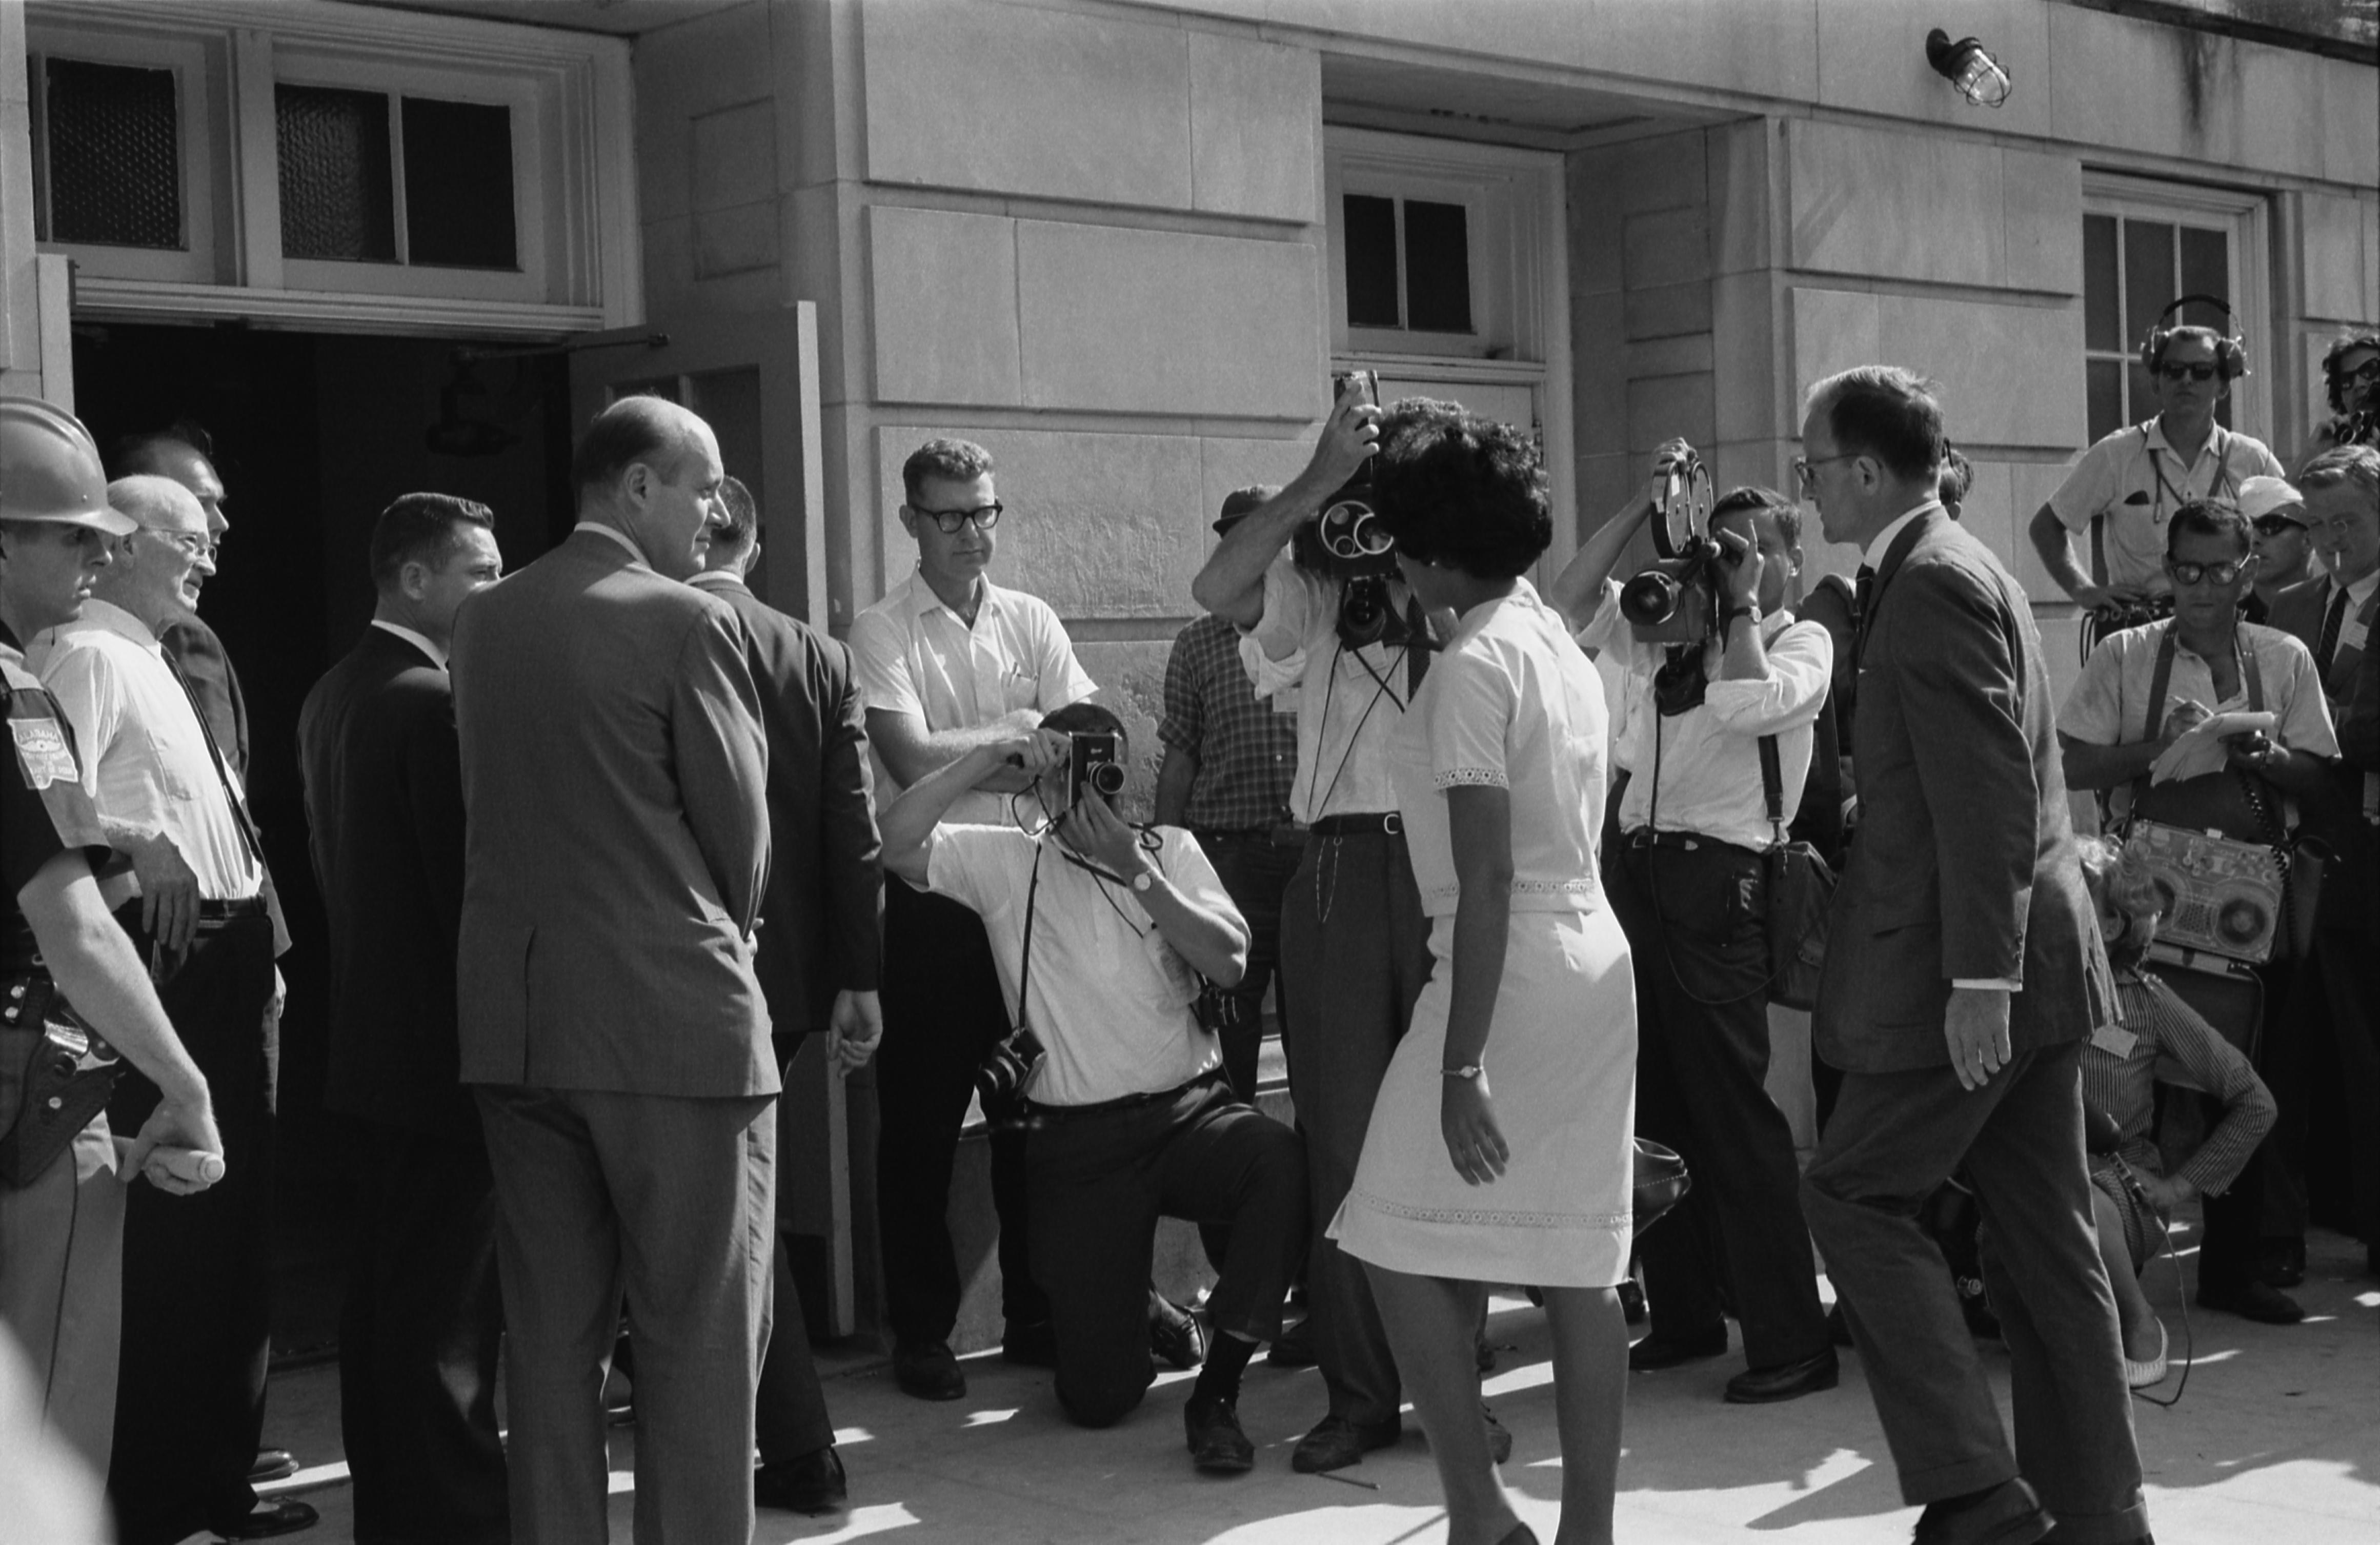 Social Studies: Civil Rights Movement and School Segregation - Magazine cover